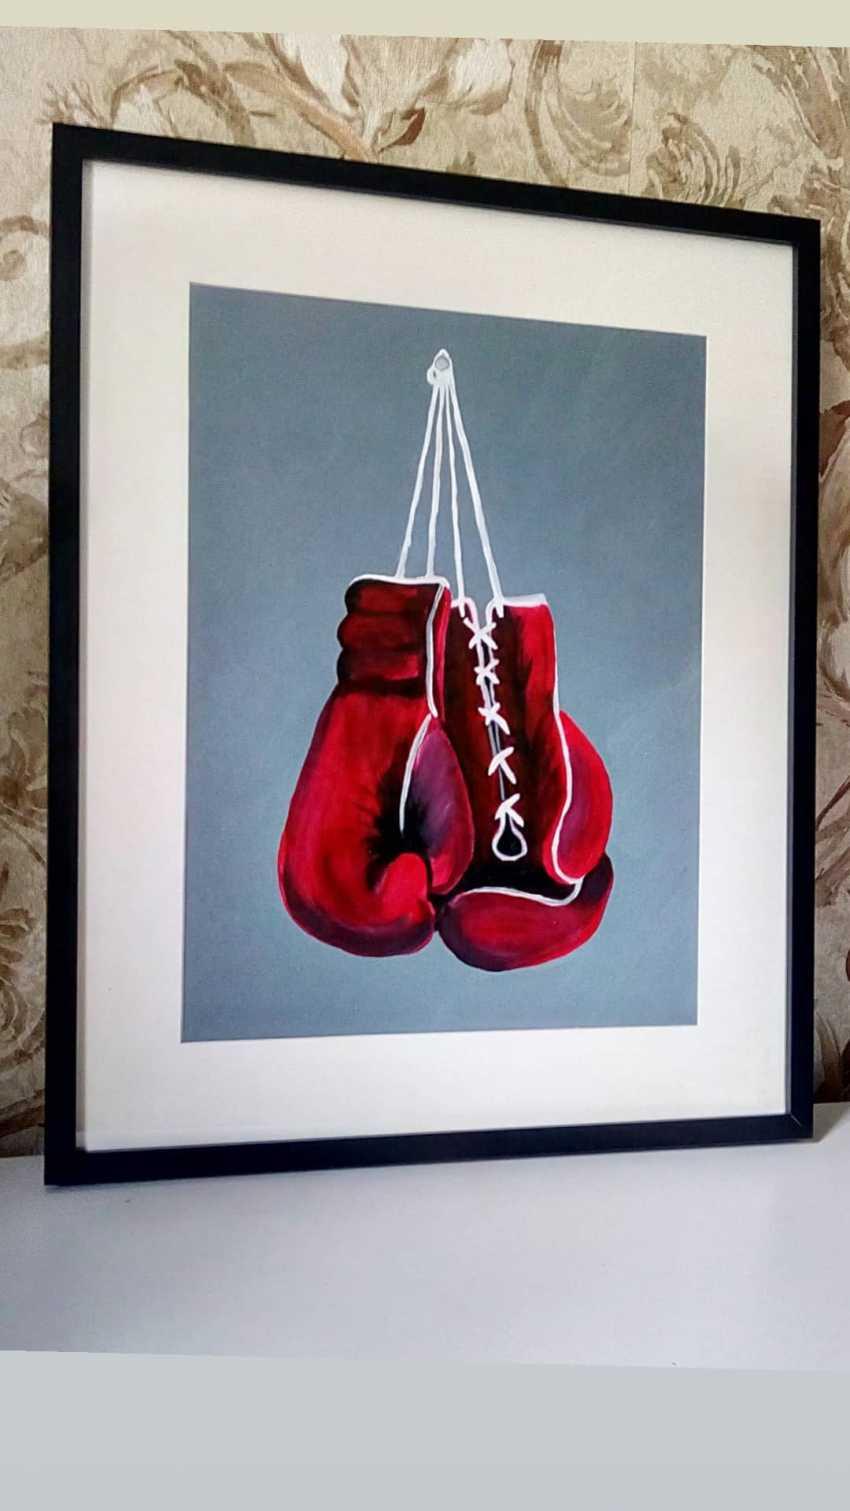 Anna B. Boxing - photo 1